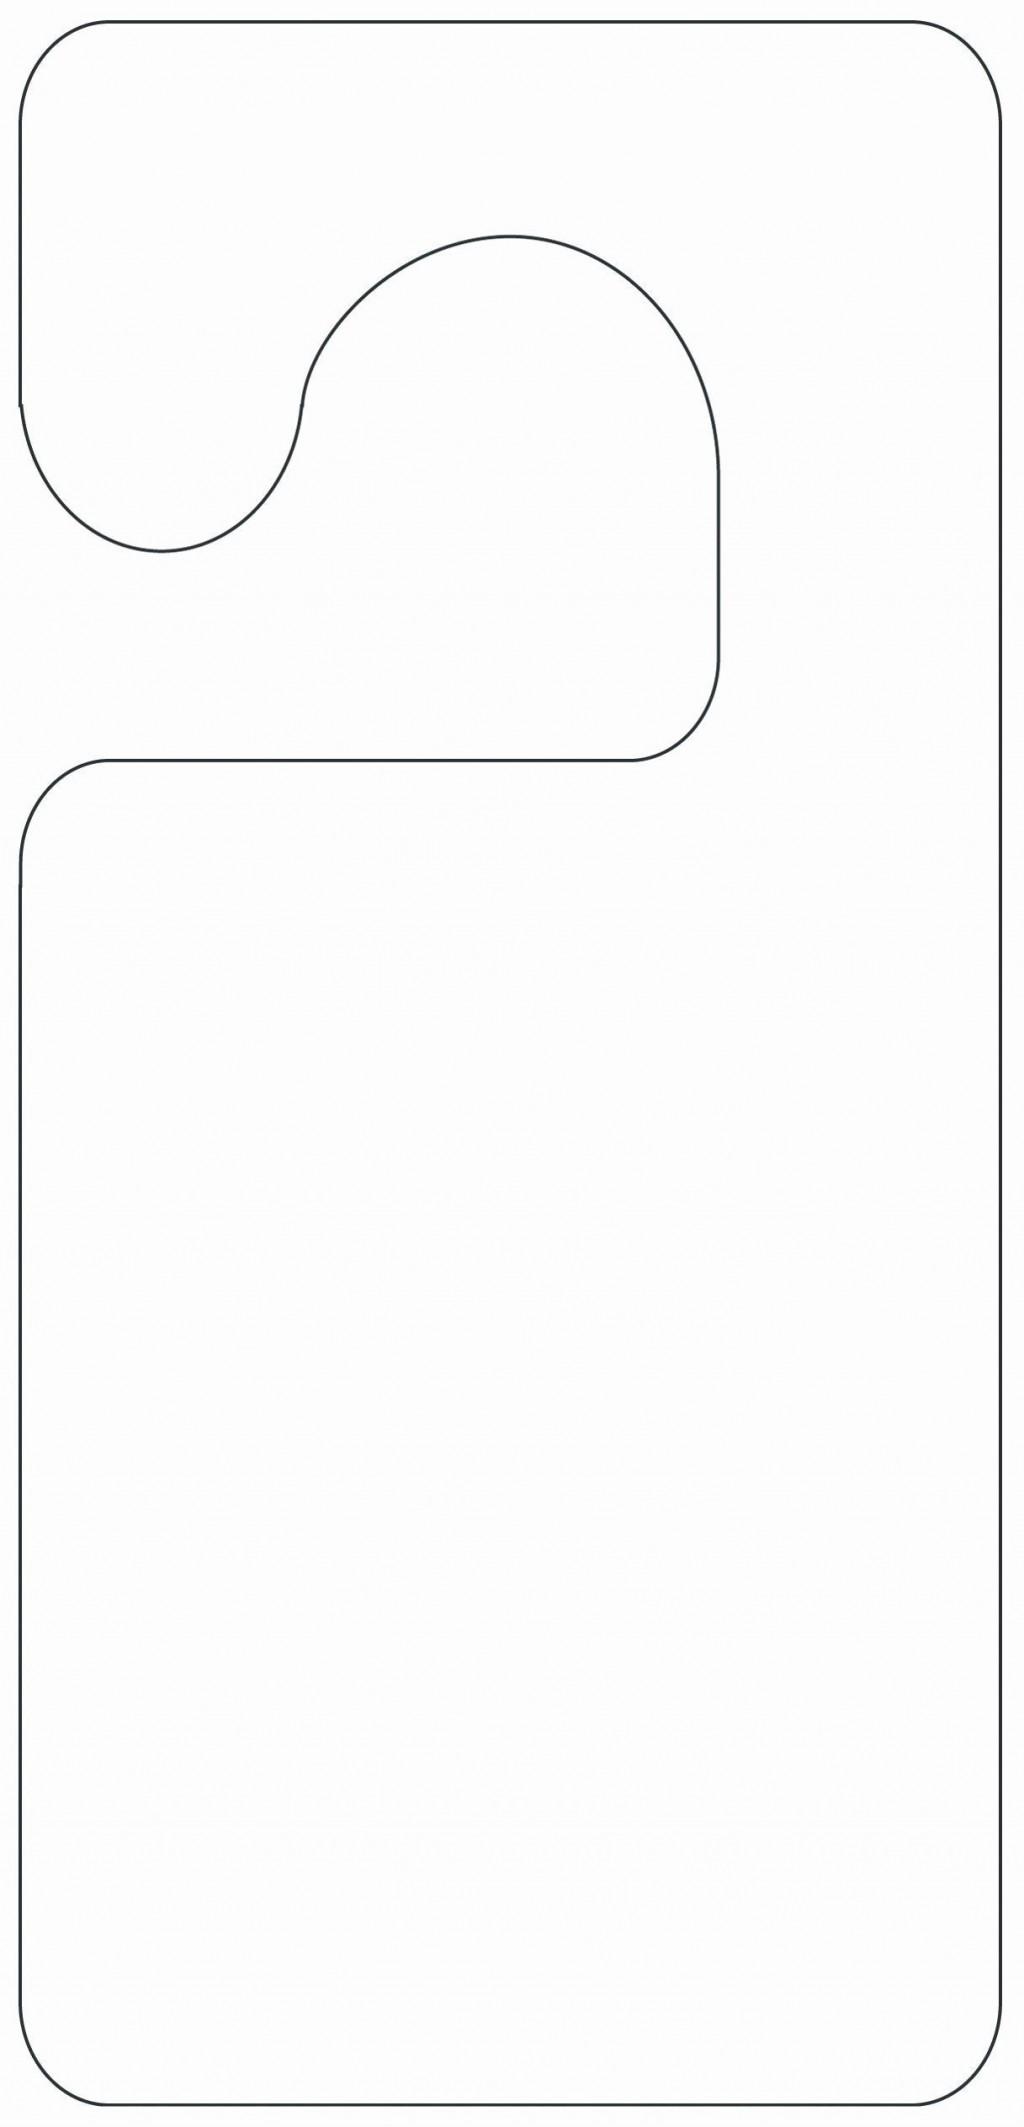 002 Wondrou Free Printable Template For Door Hanger Sample Large